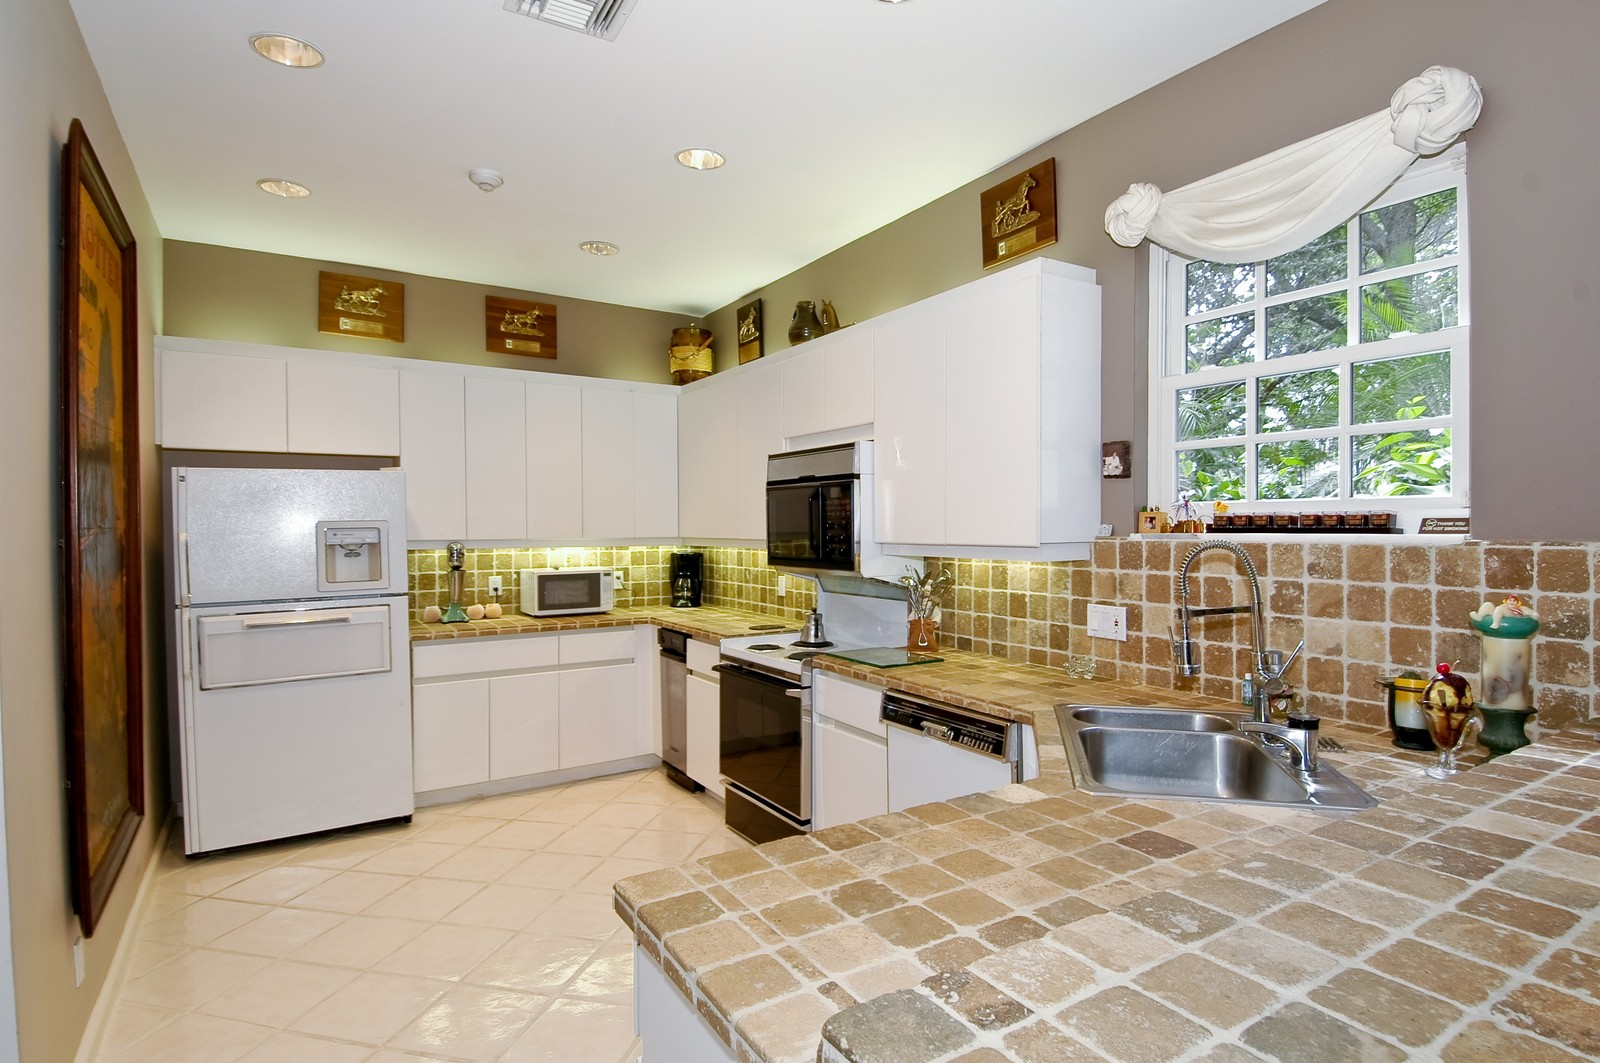 Real Estate Photography - 3685 NE 195 Ter, Aventura, FL, 33180 - Kitchen